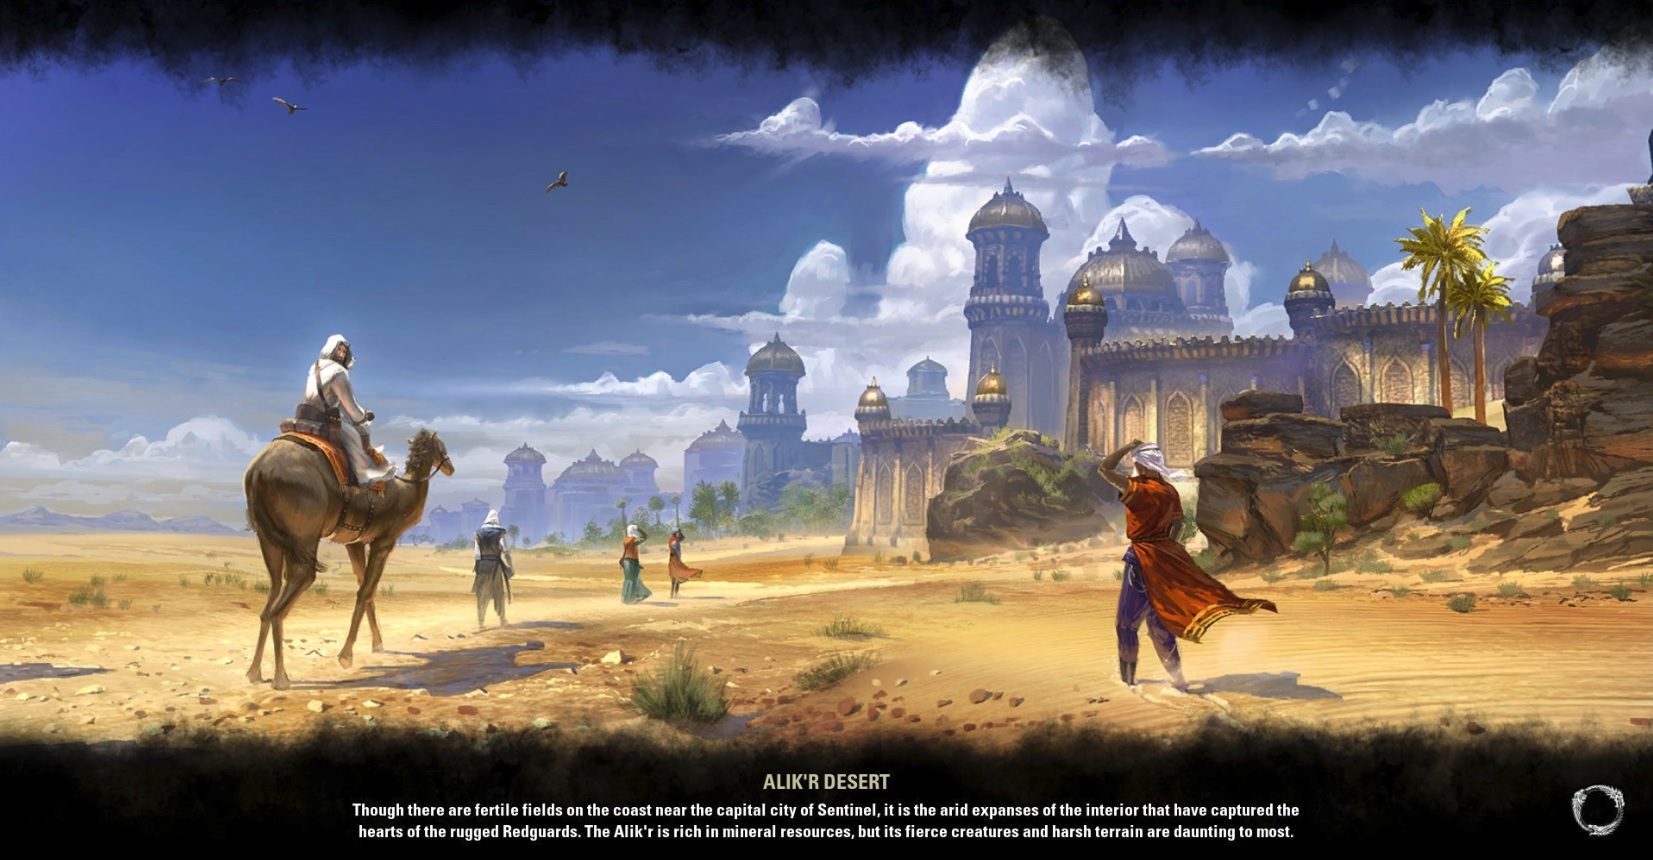 Elder Scrolls Online: Alik'r Magic | The Last Chapter Gaming